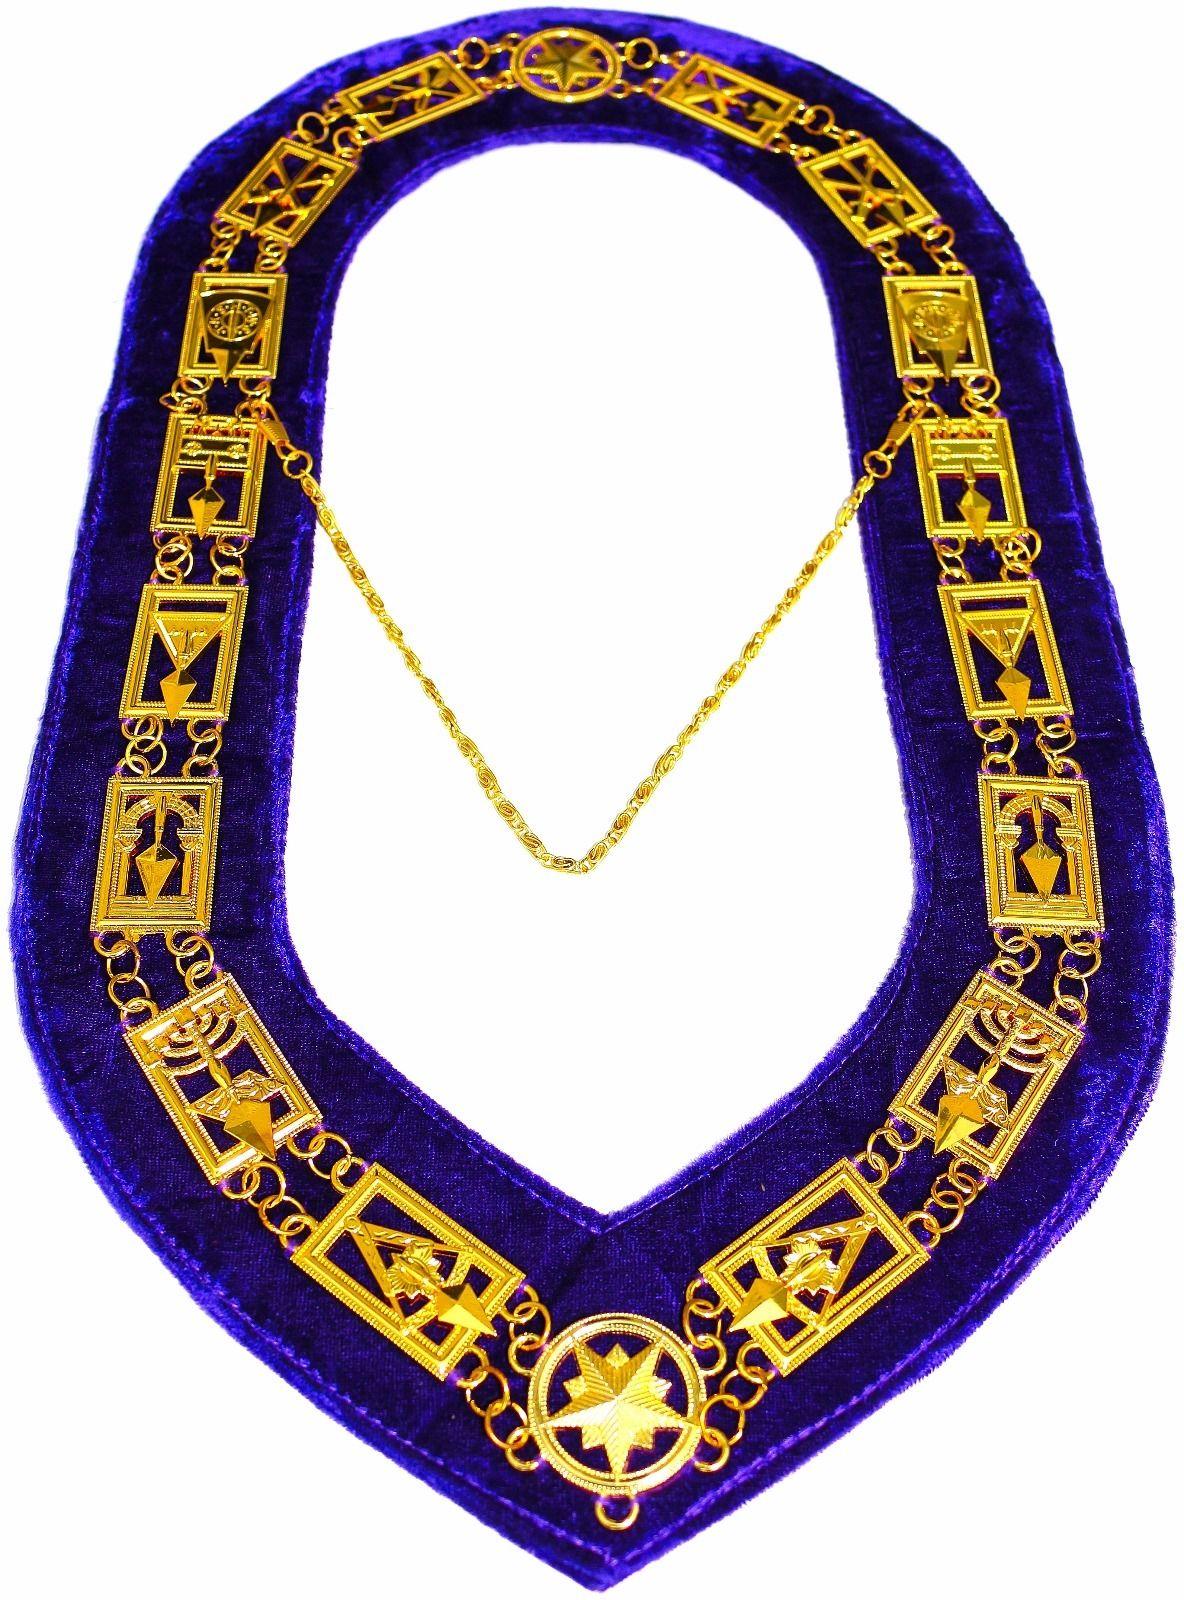 Masonic Collars